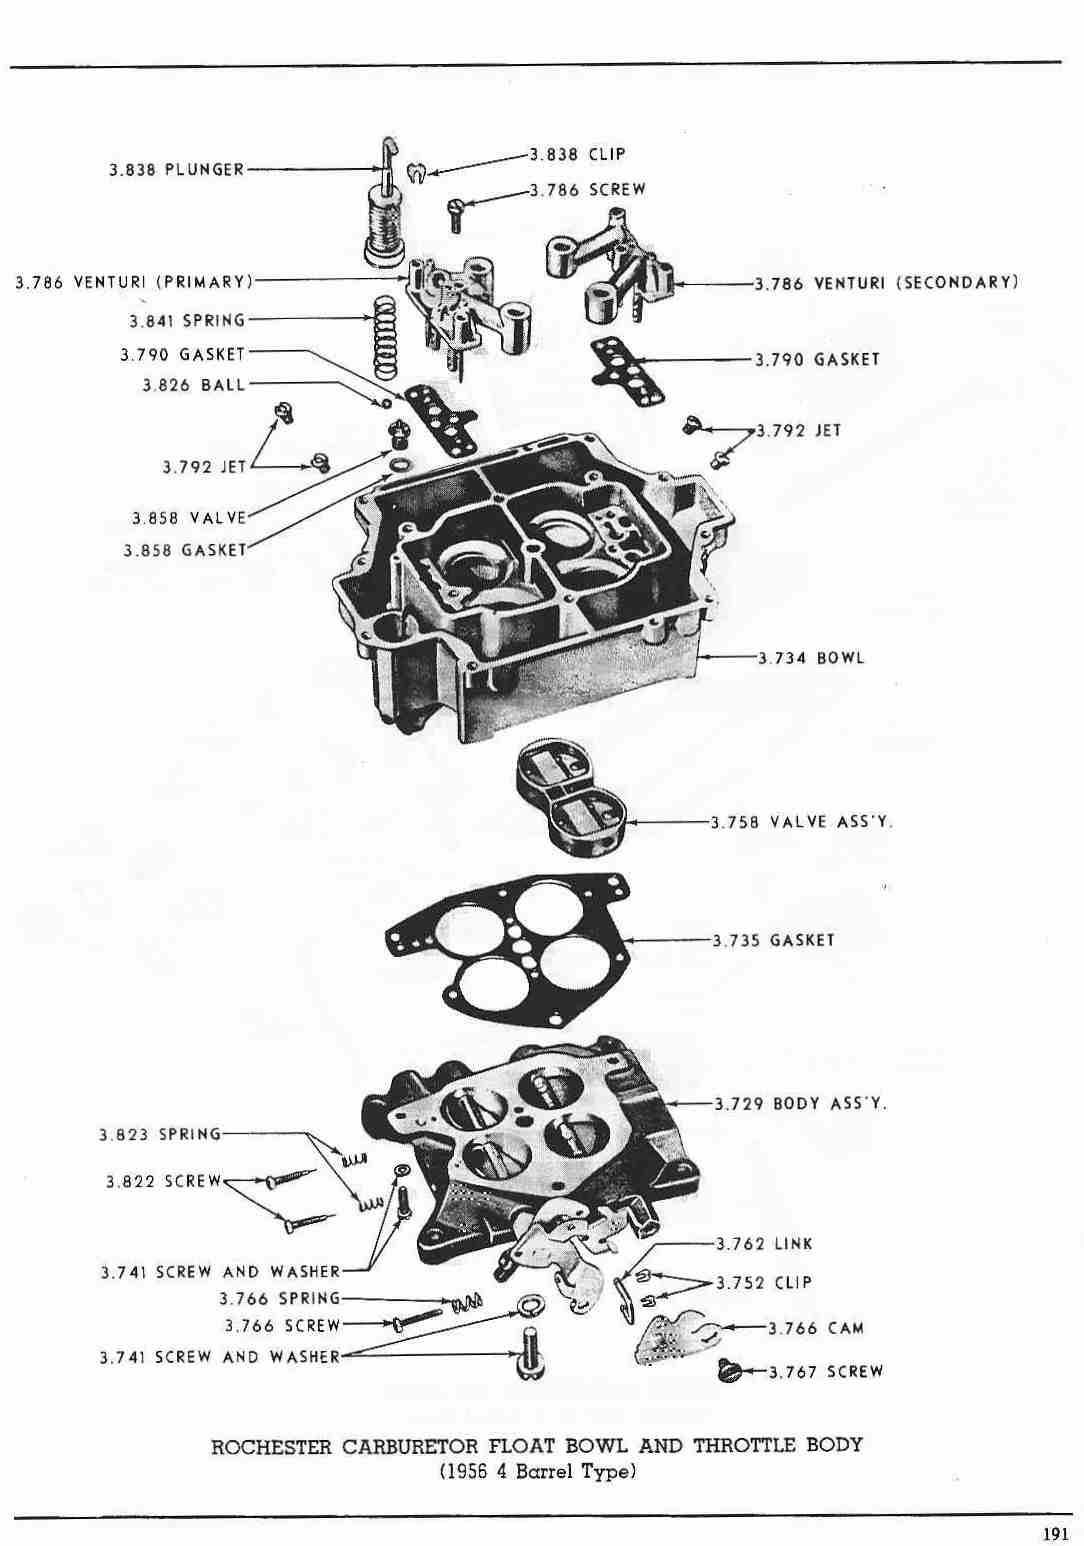 rochester 4 barrel carburetor diagram 2005 nissan altima serpentine belt pontiac 1960 master parts catalog